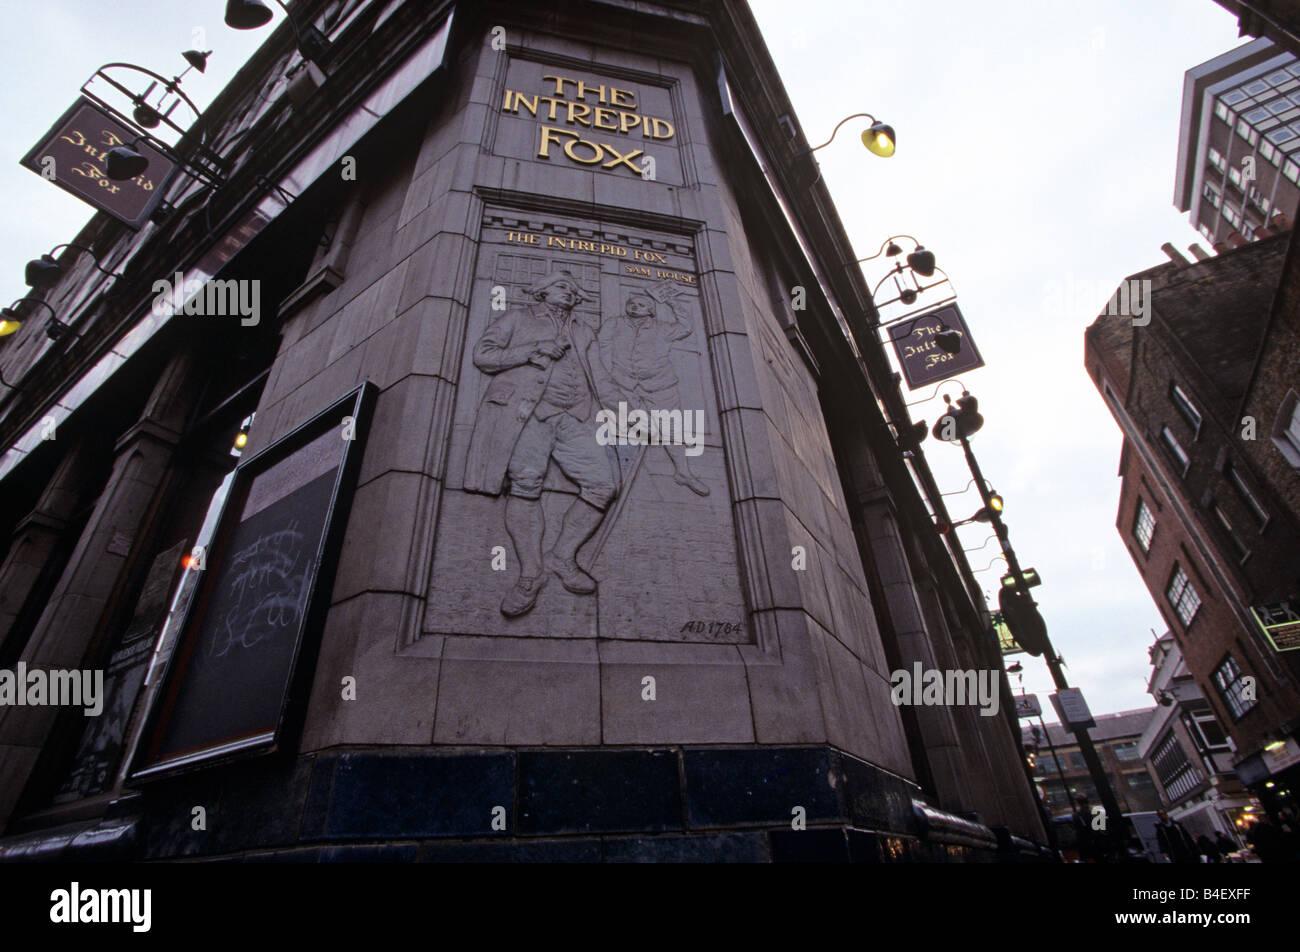 The Intrepid Fox pub, Wardour Street, Soho, London, England, UK - Stock Image